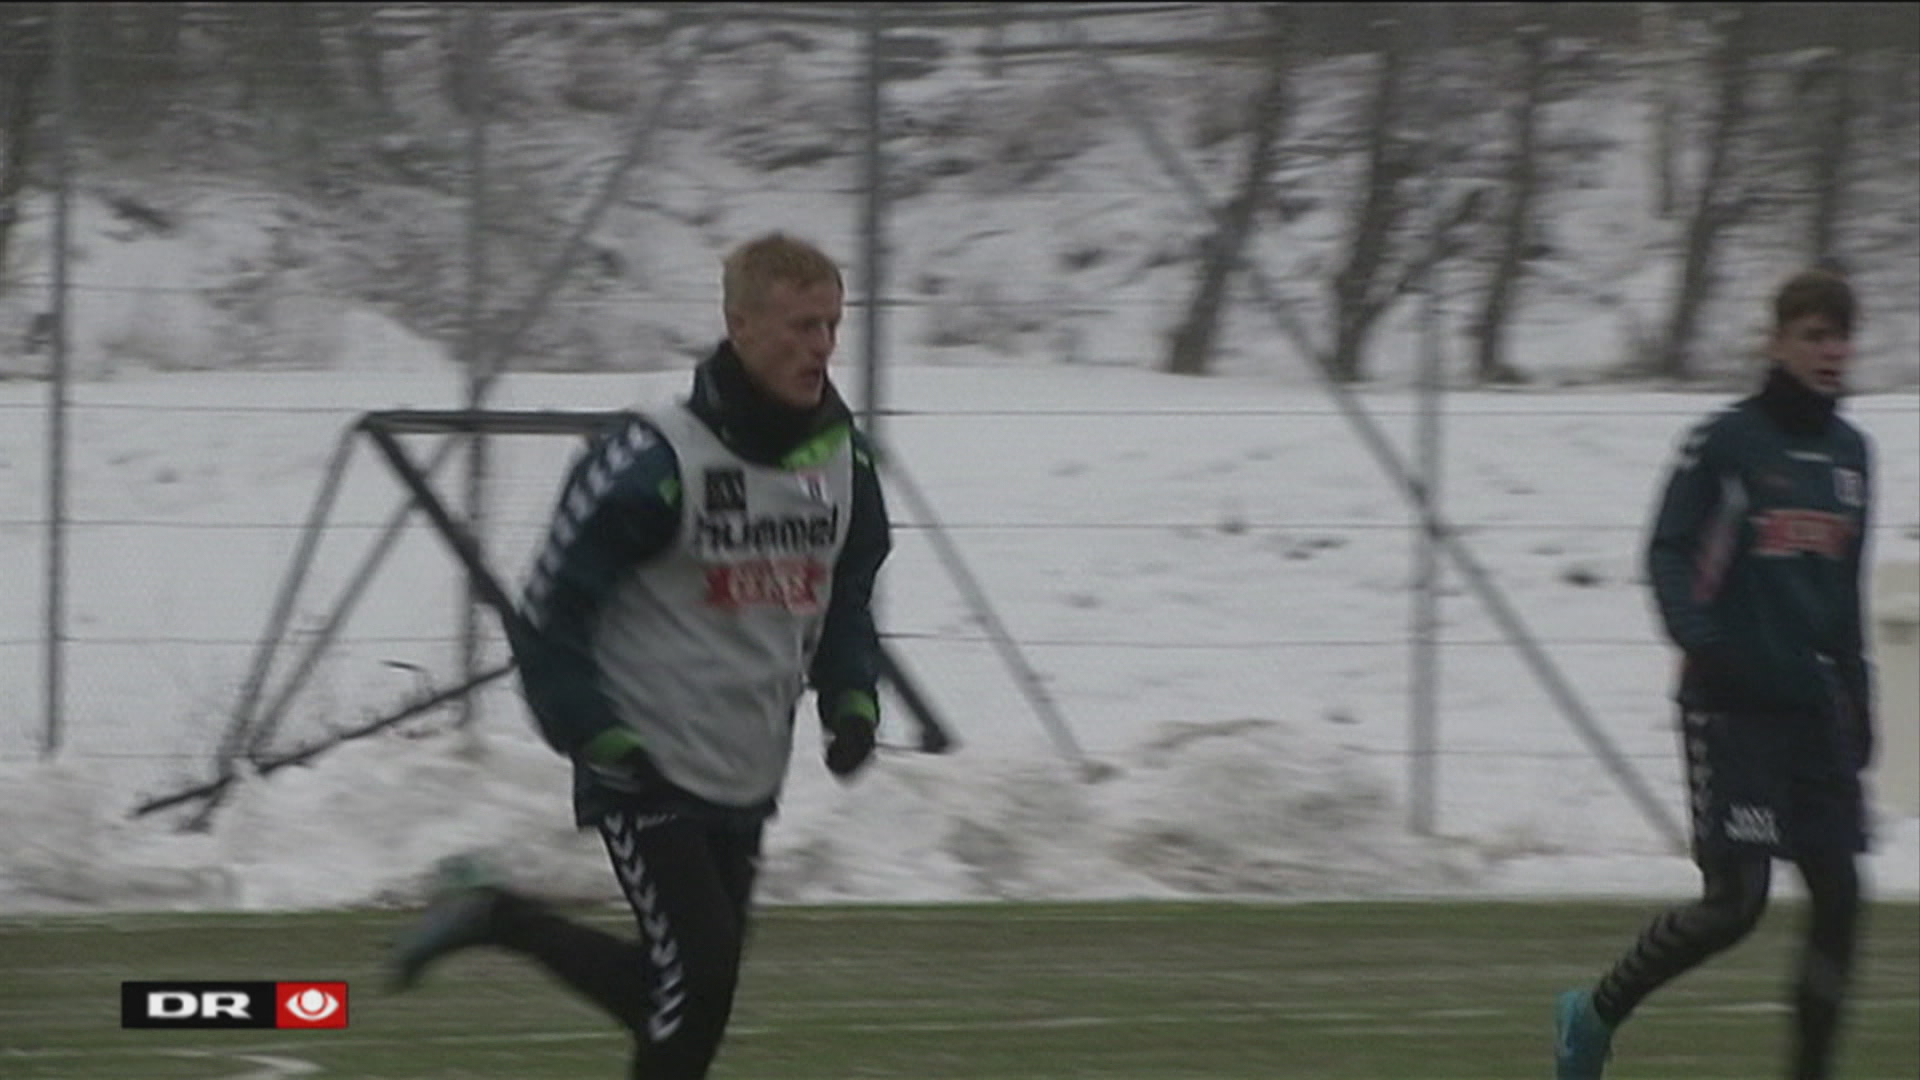 Jens Jønsson